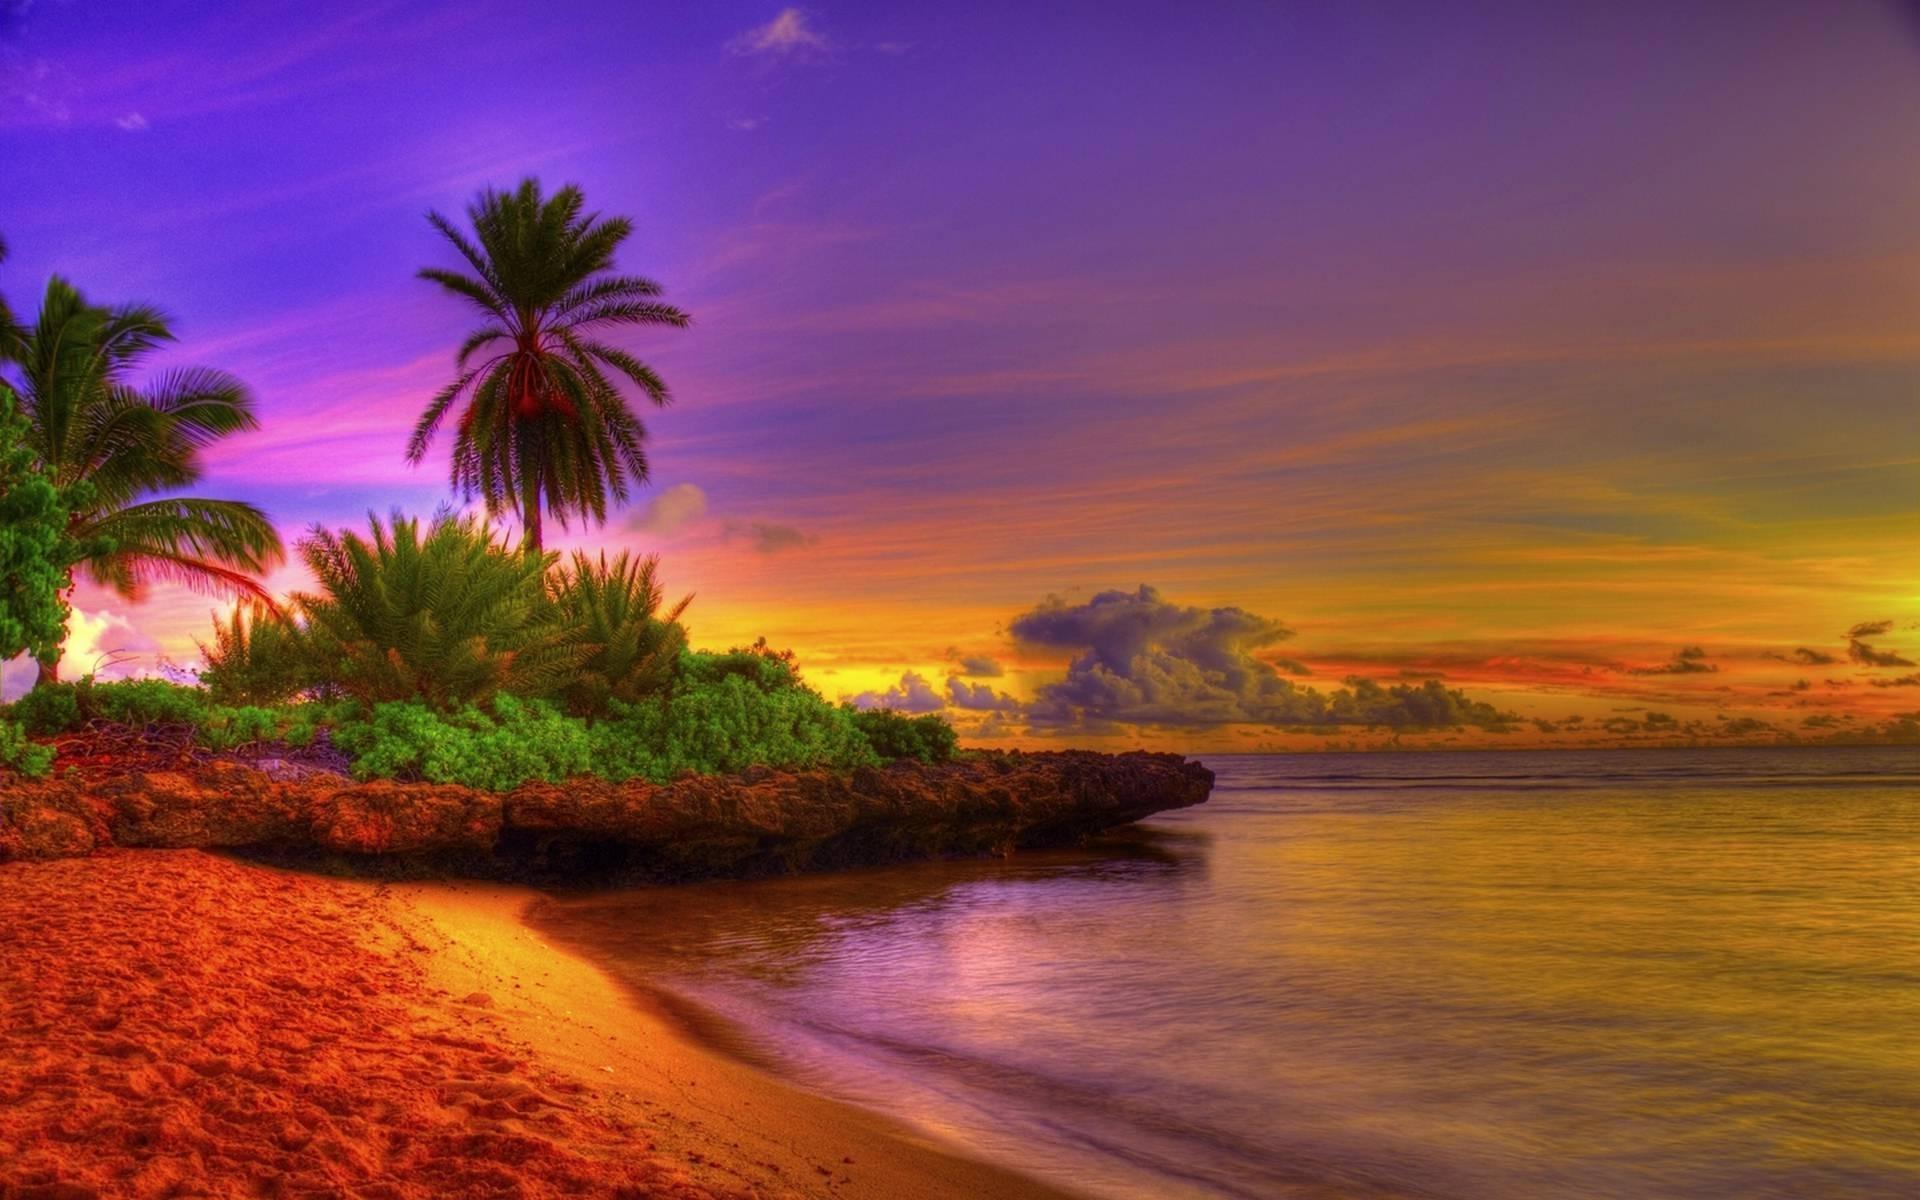 Sunrise Tropical Beach #15592 Wallpaper | Wallpaper hd